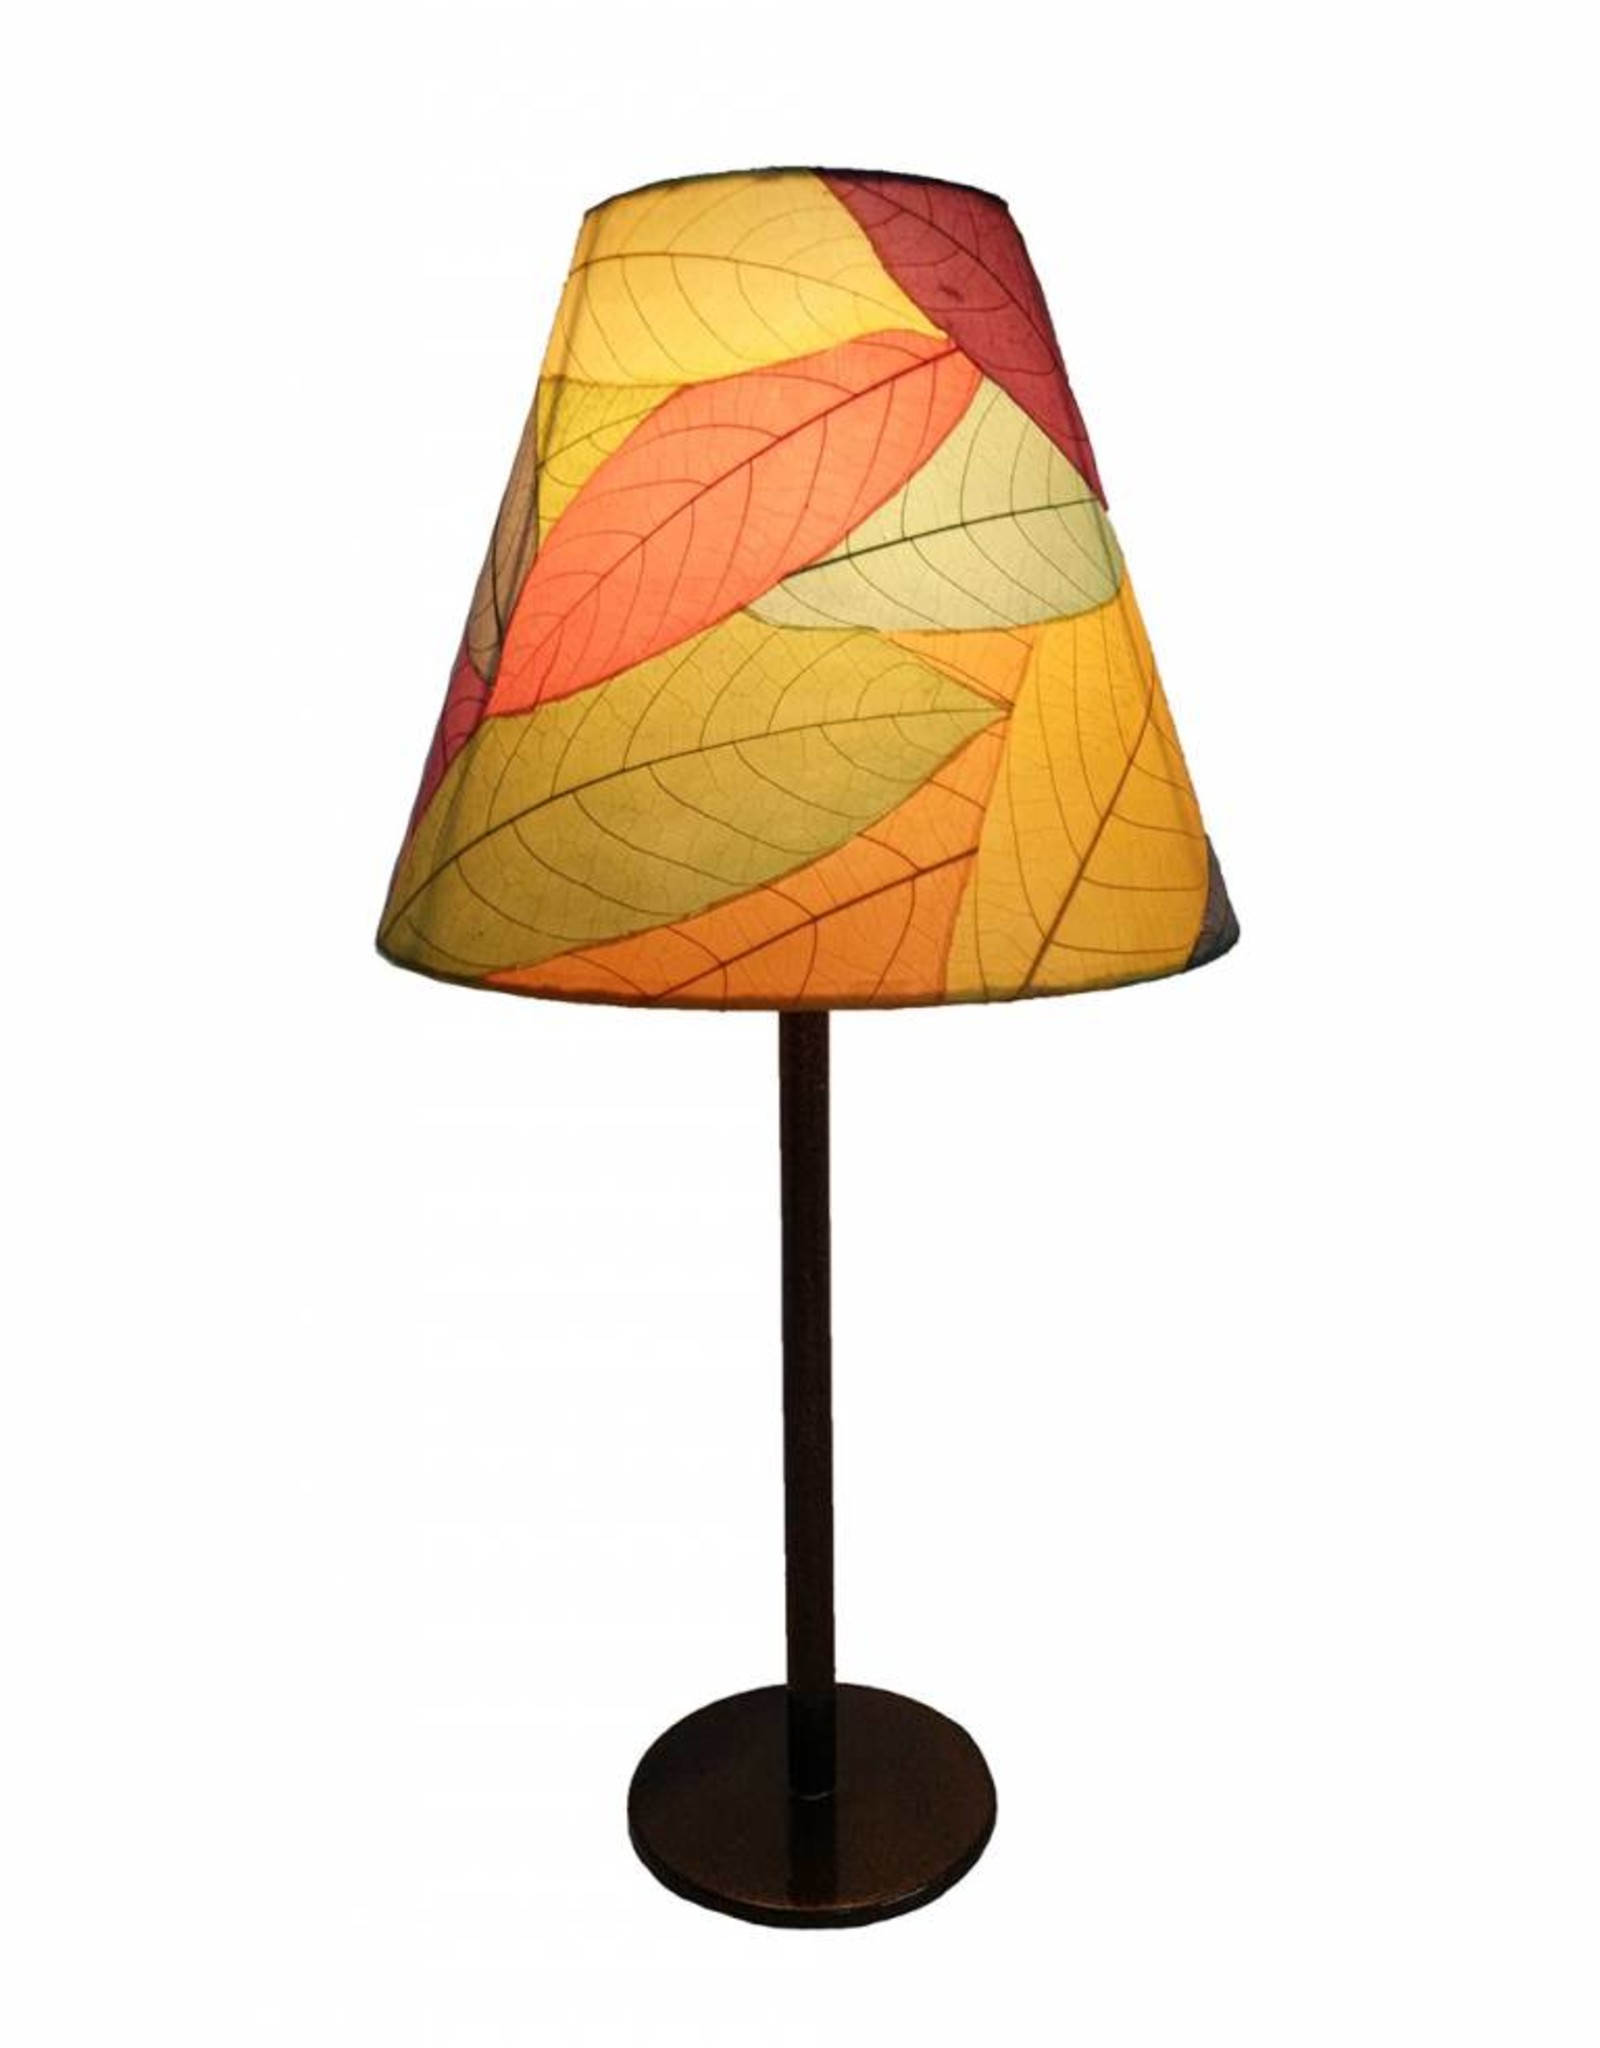 Eangee Outdoor Mushroom Table Lamp